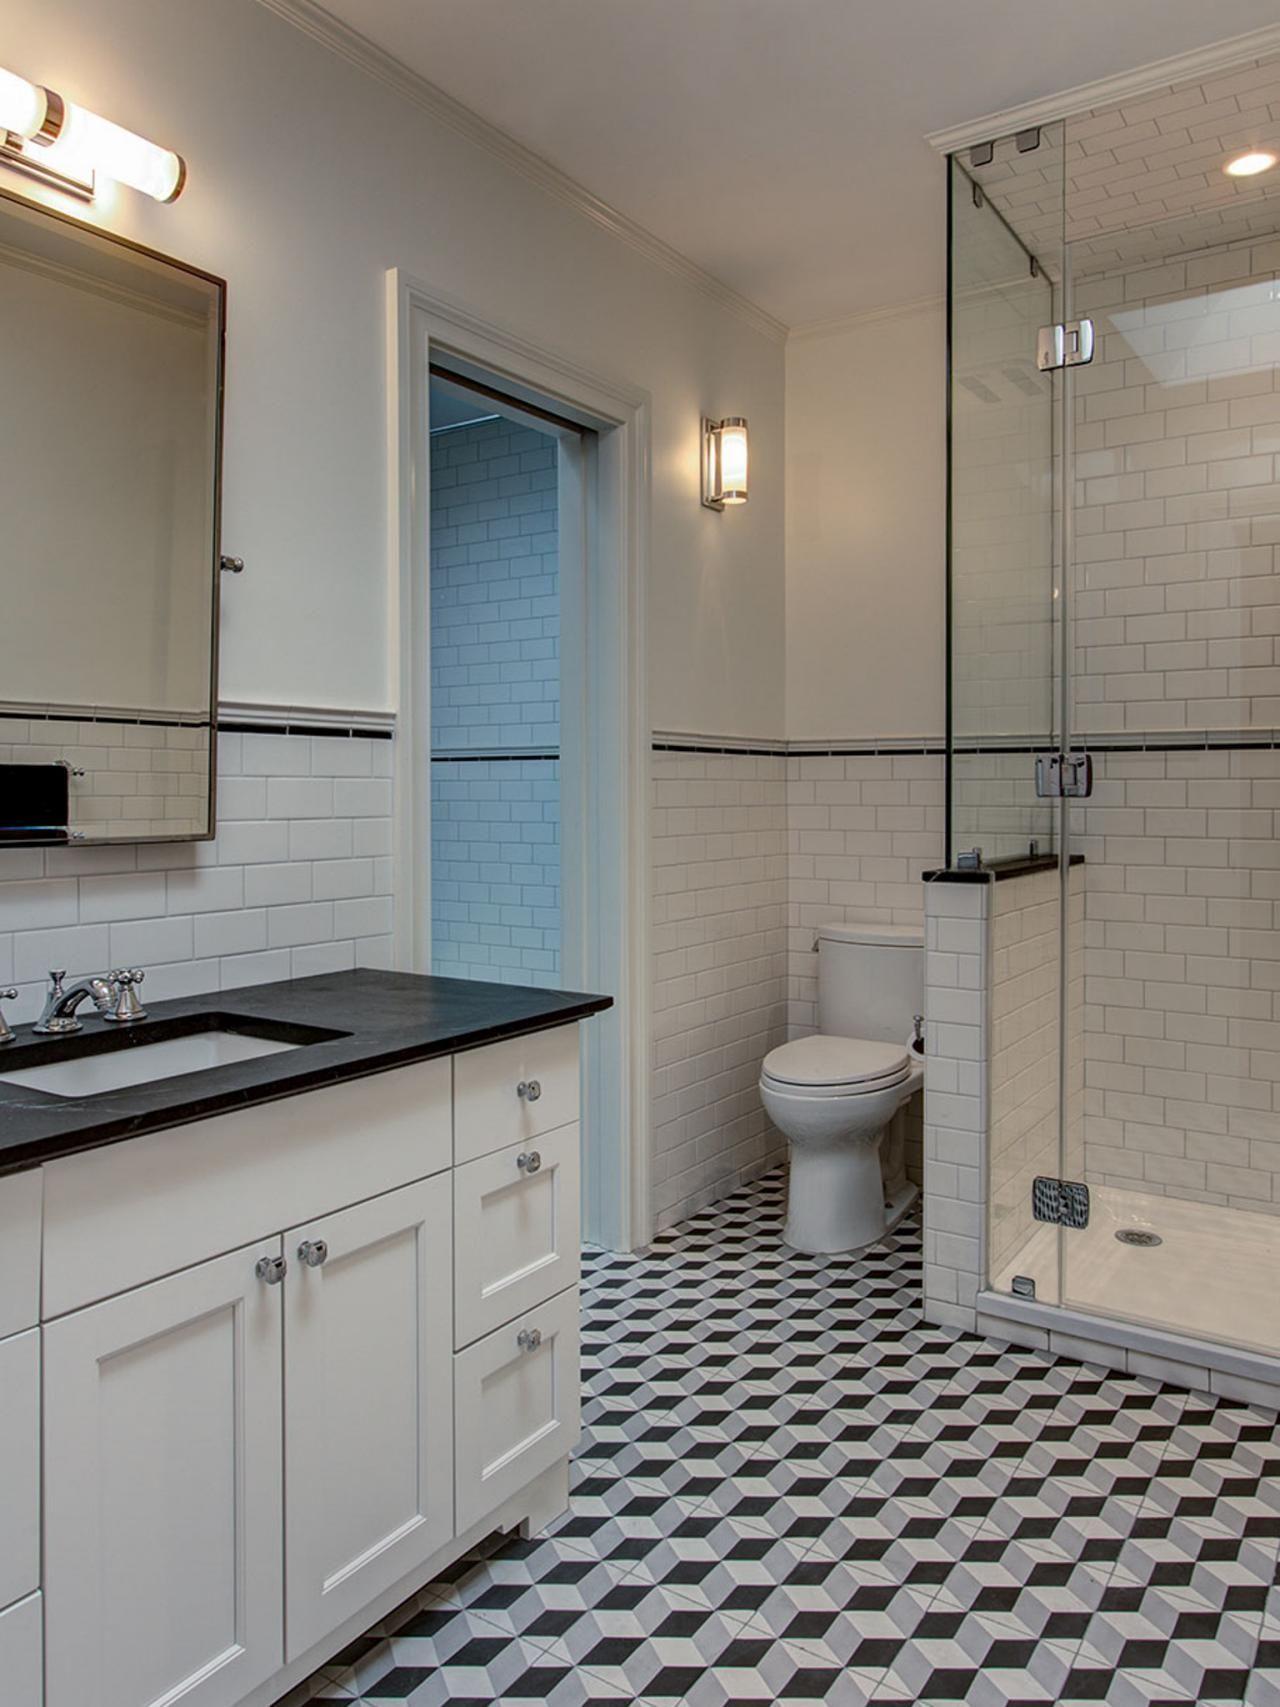 Transitional Bathroom With Geometric Tile Floor Transitional Bathroom Design Bathroom Design Minimalist Bathroom